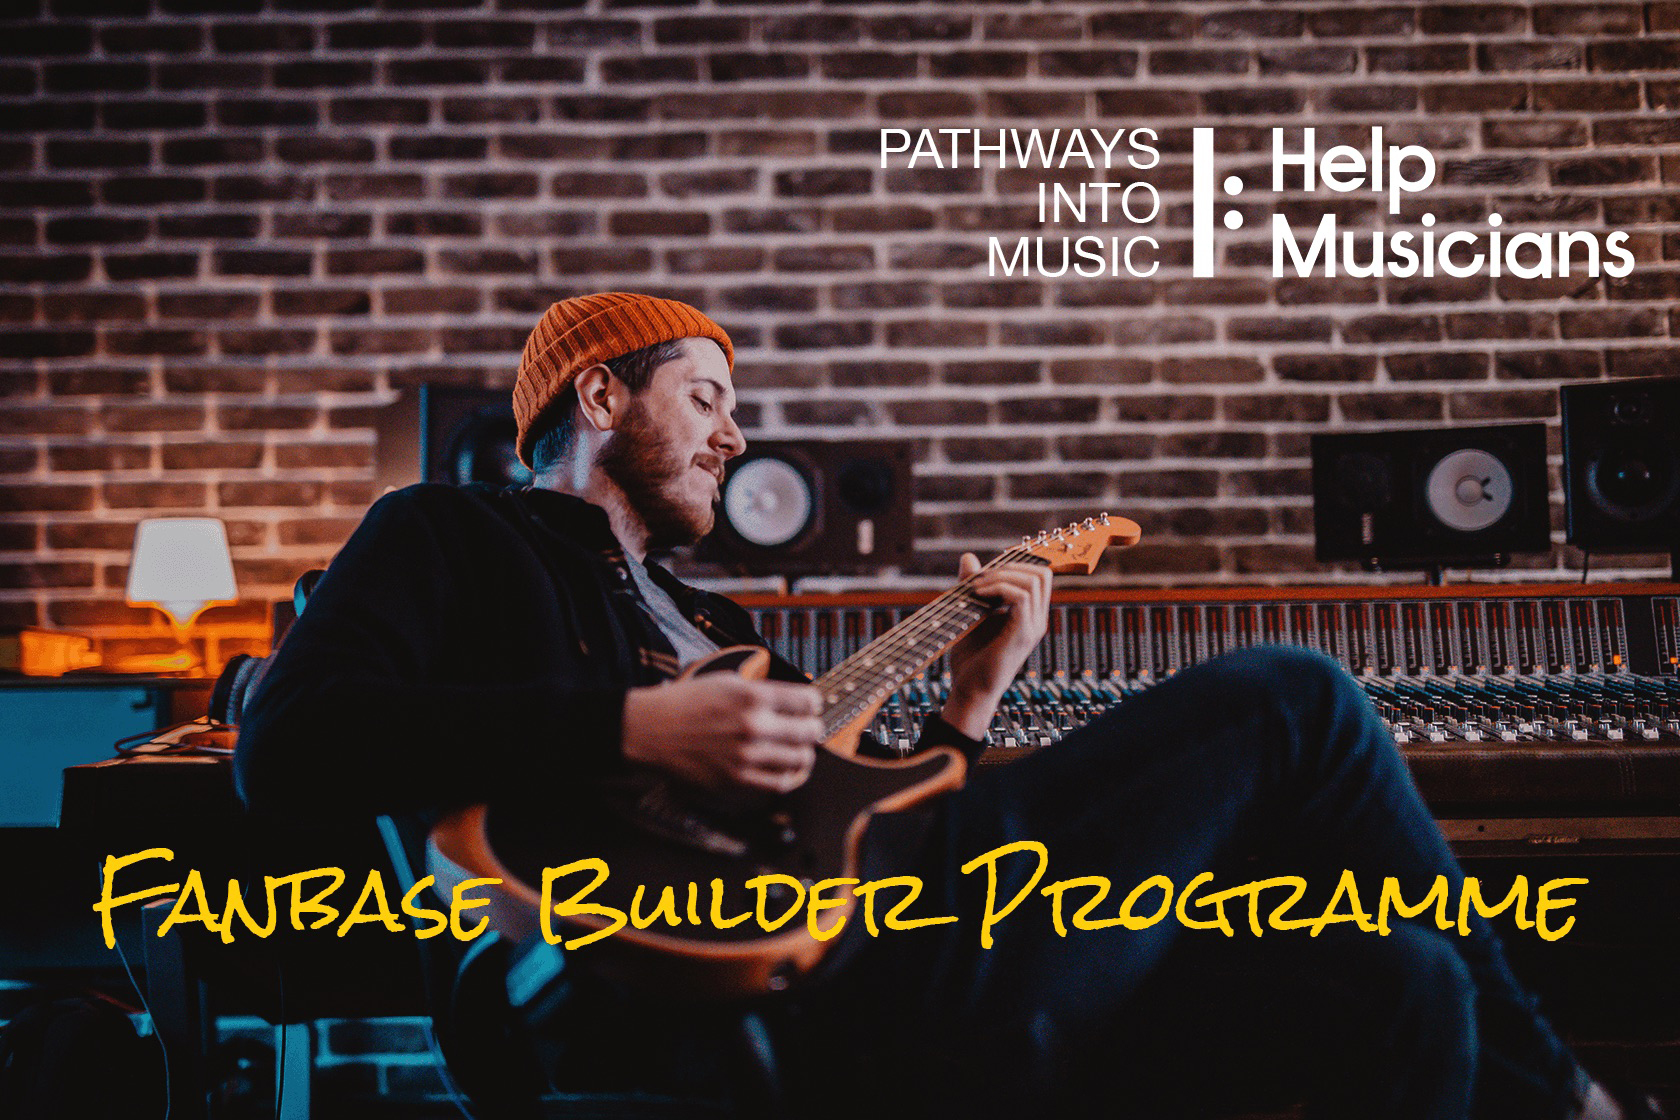 the Fanbase Builder Programme